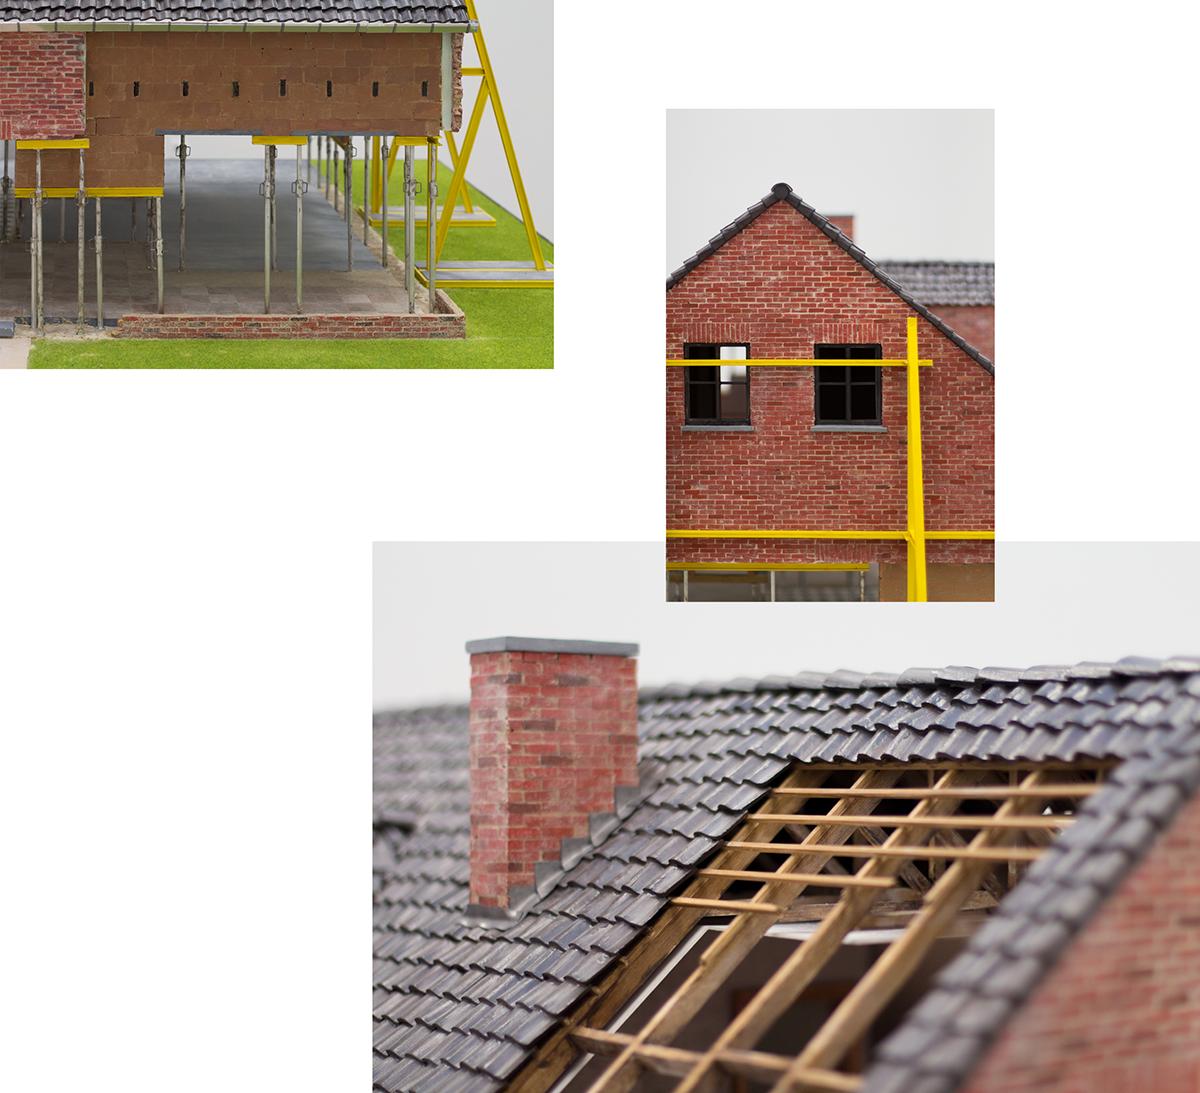 work-model-house-gijs-van-vaerenbergh-hannelore-veelaert-9887